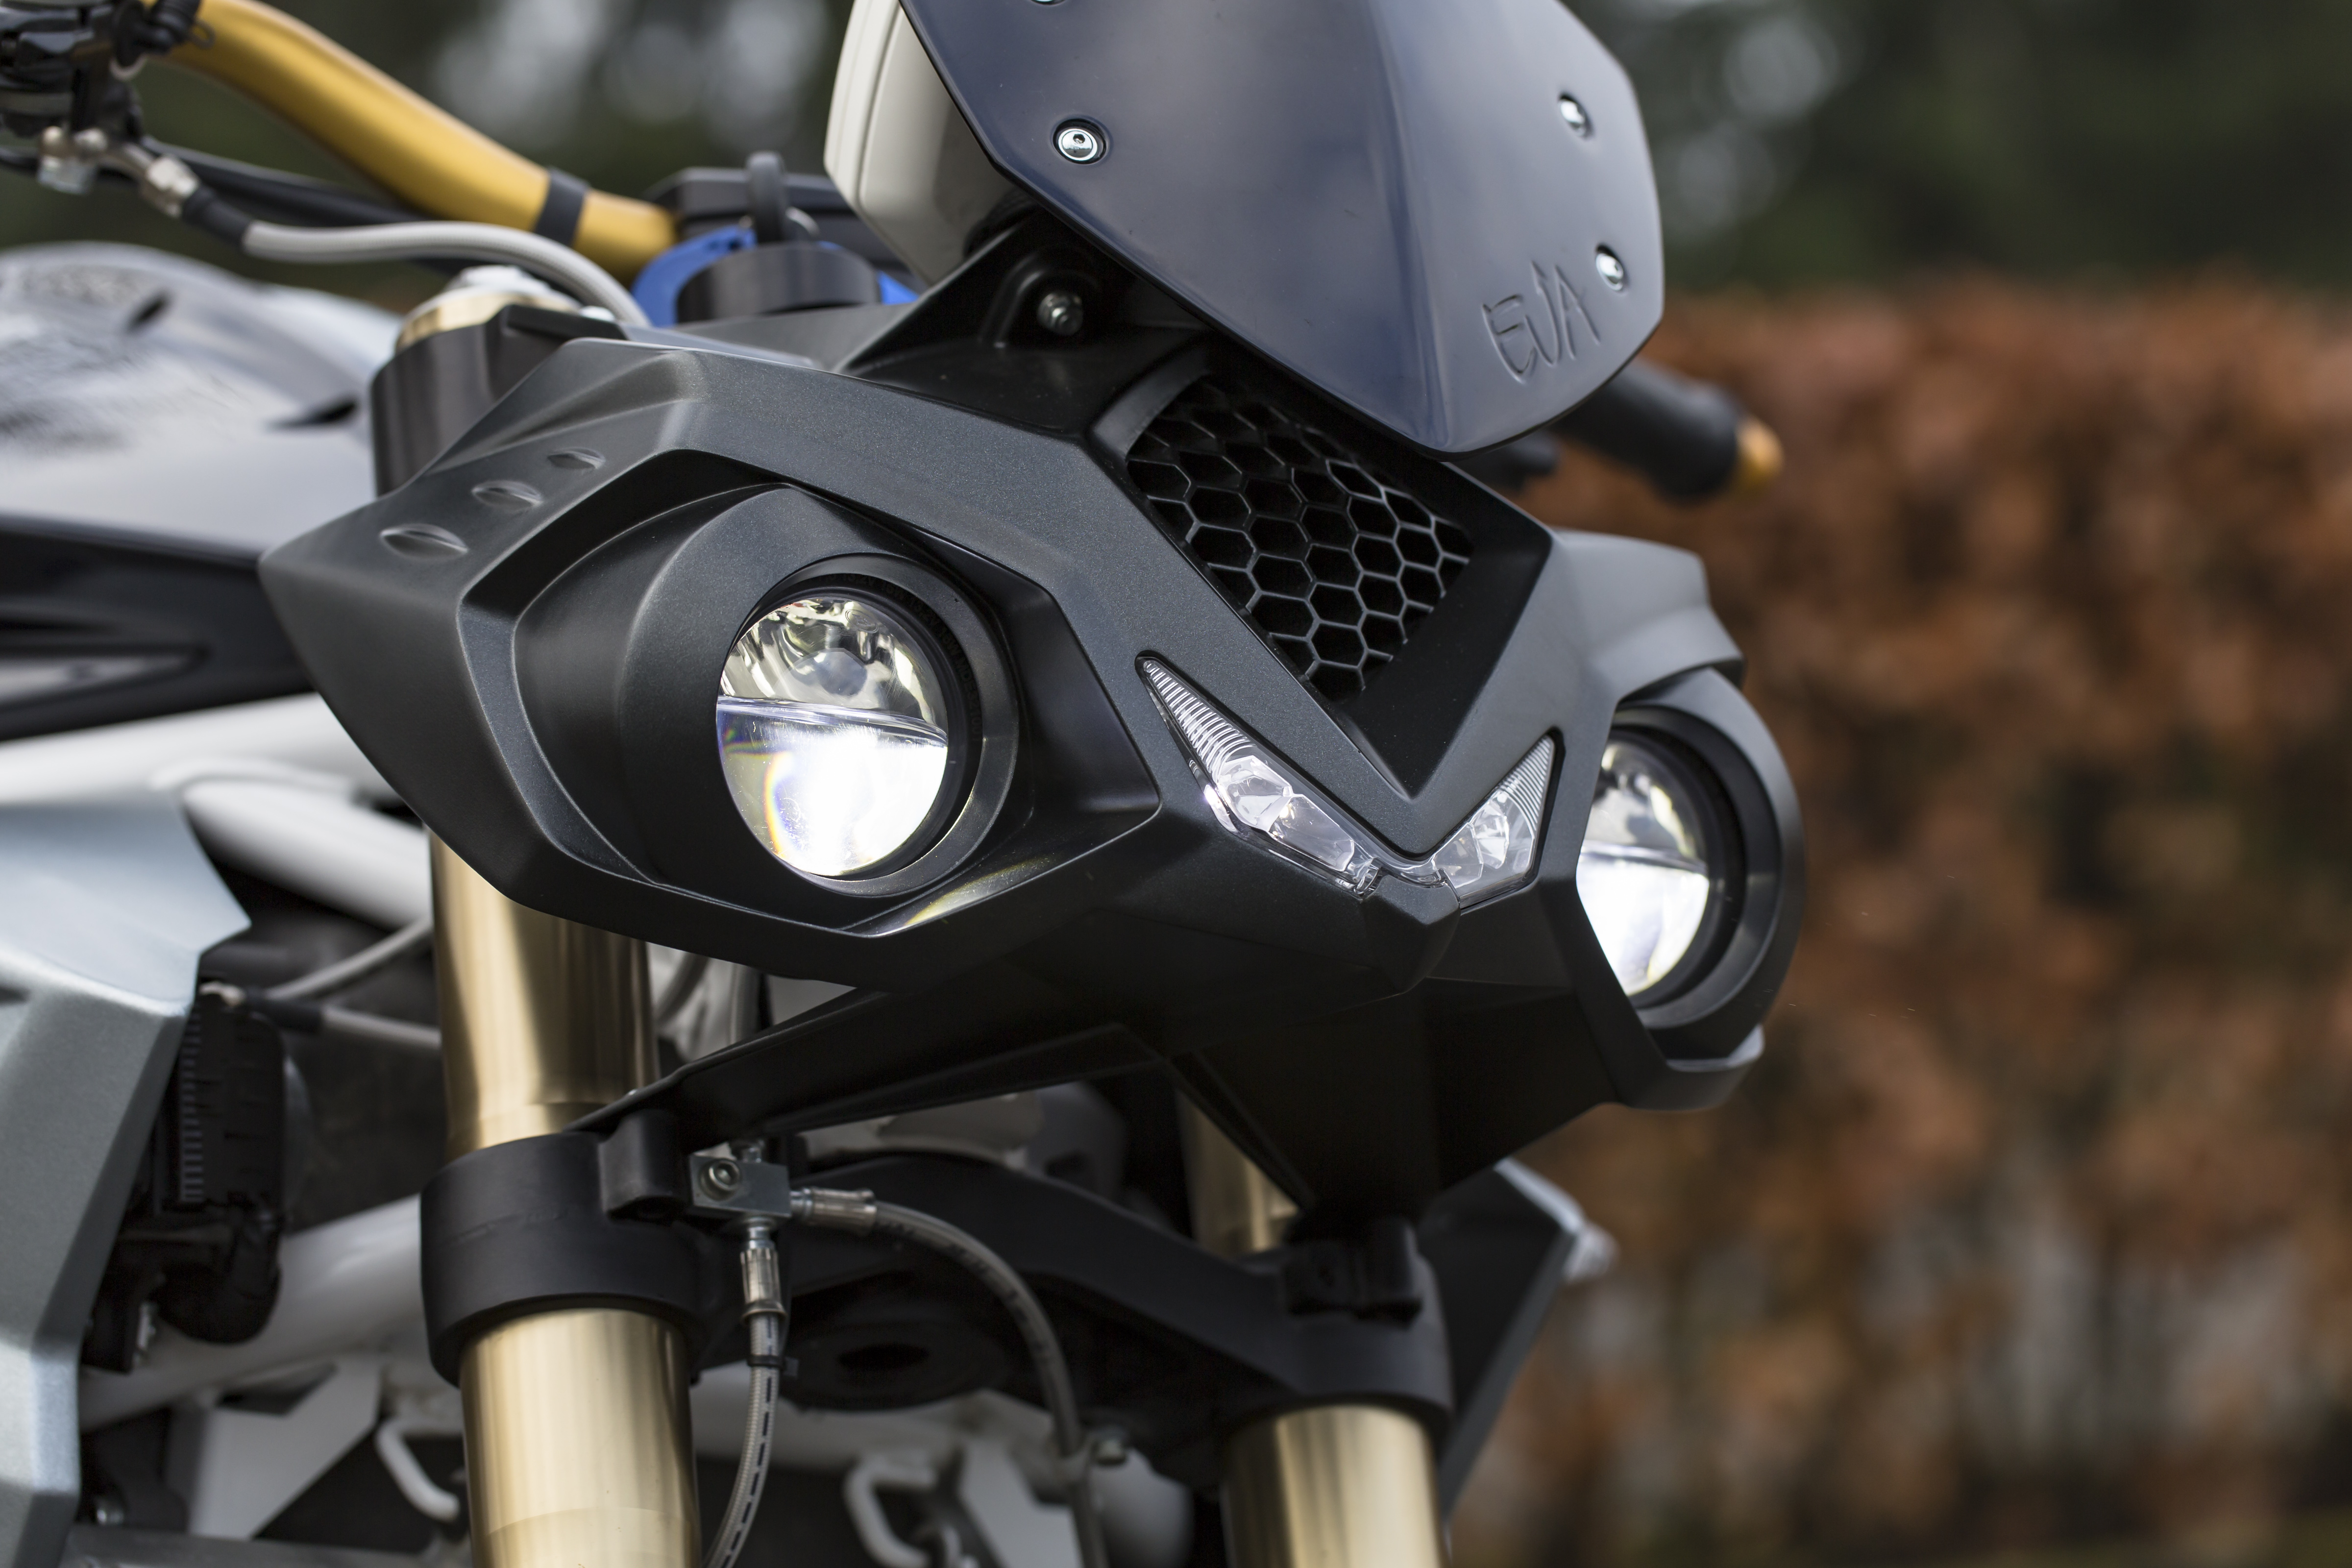 Energica-Eva-e-bike-5